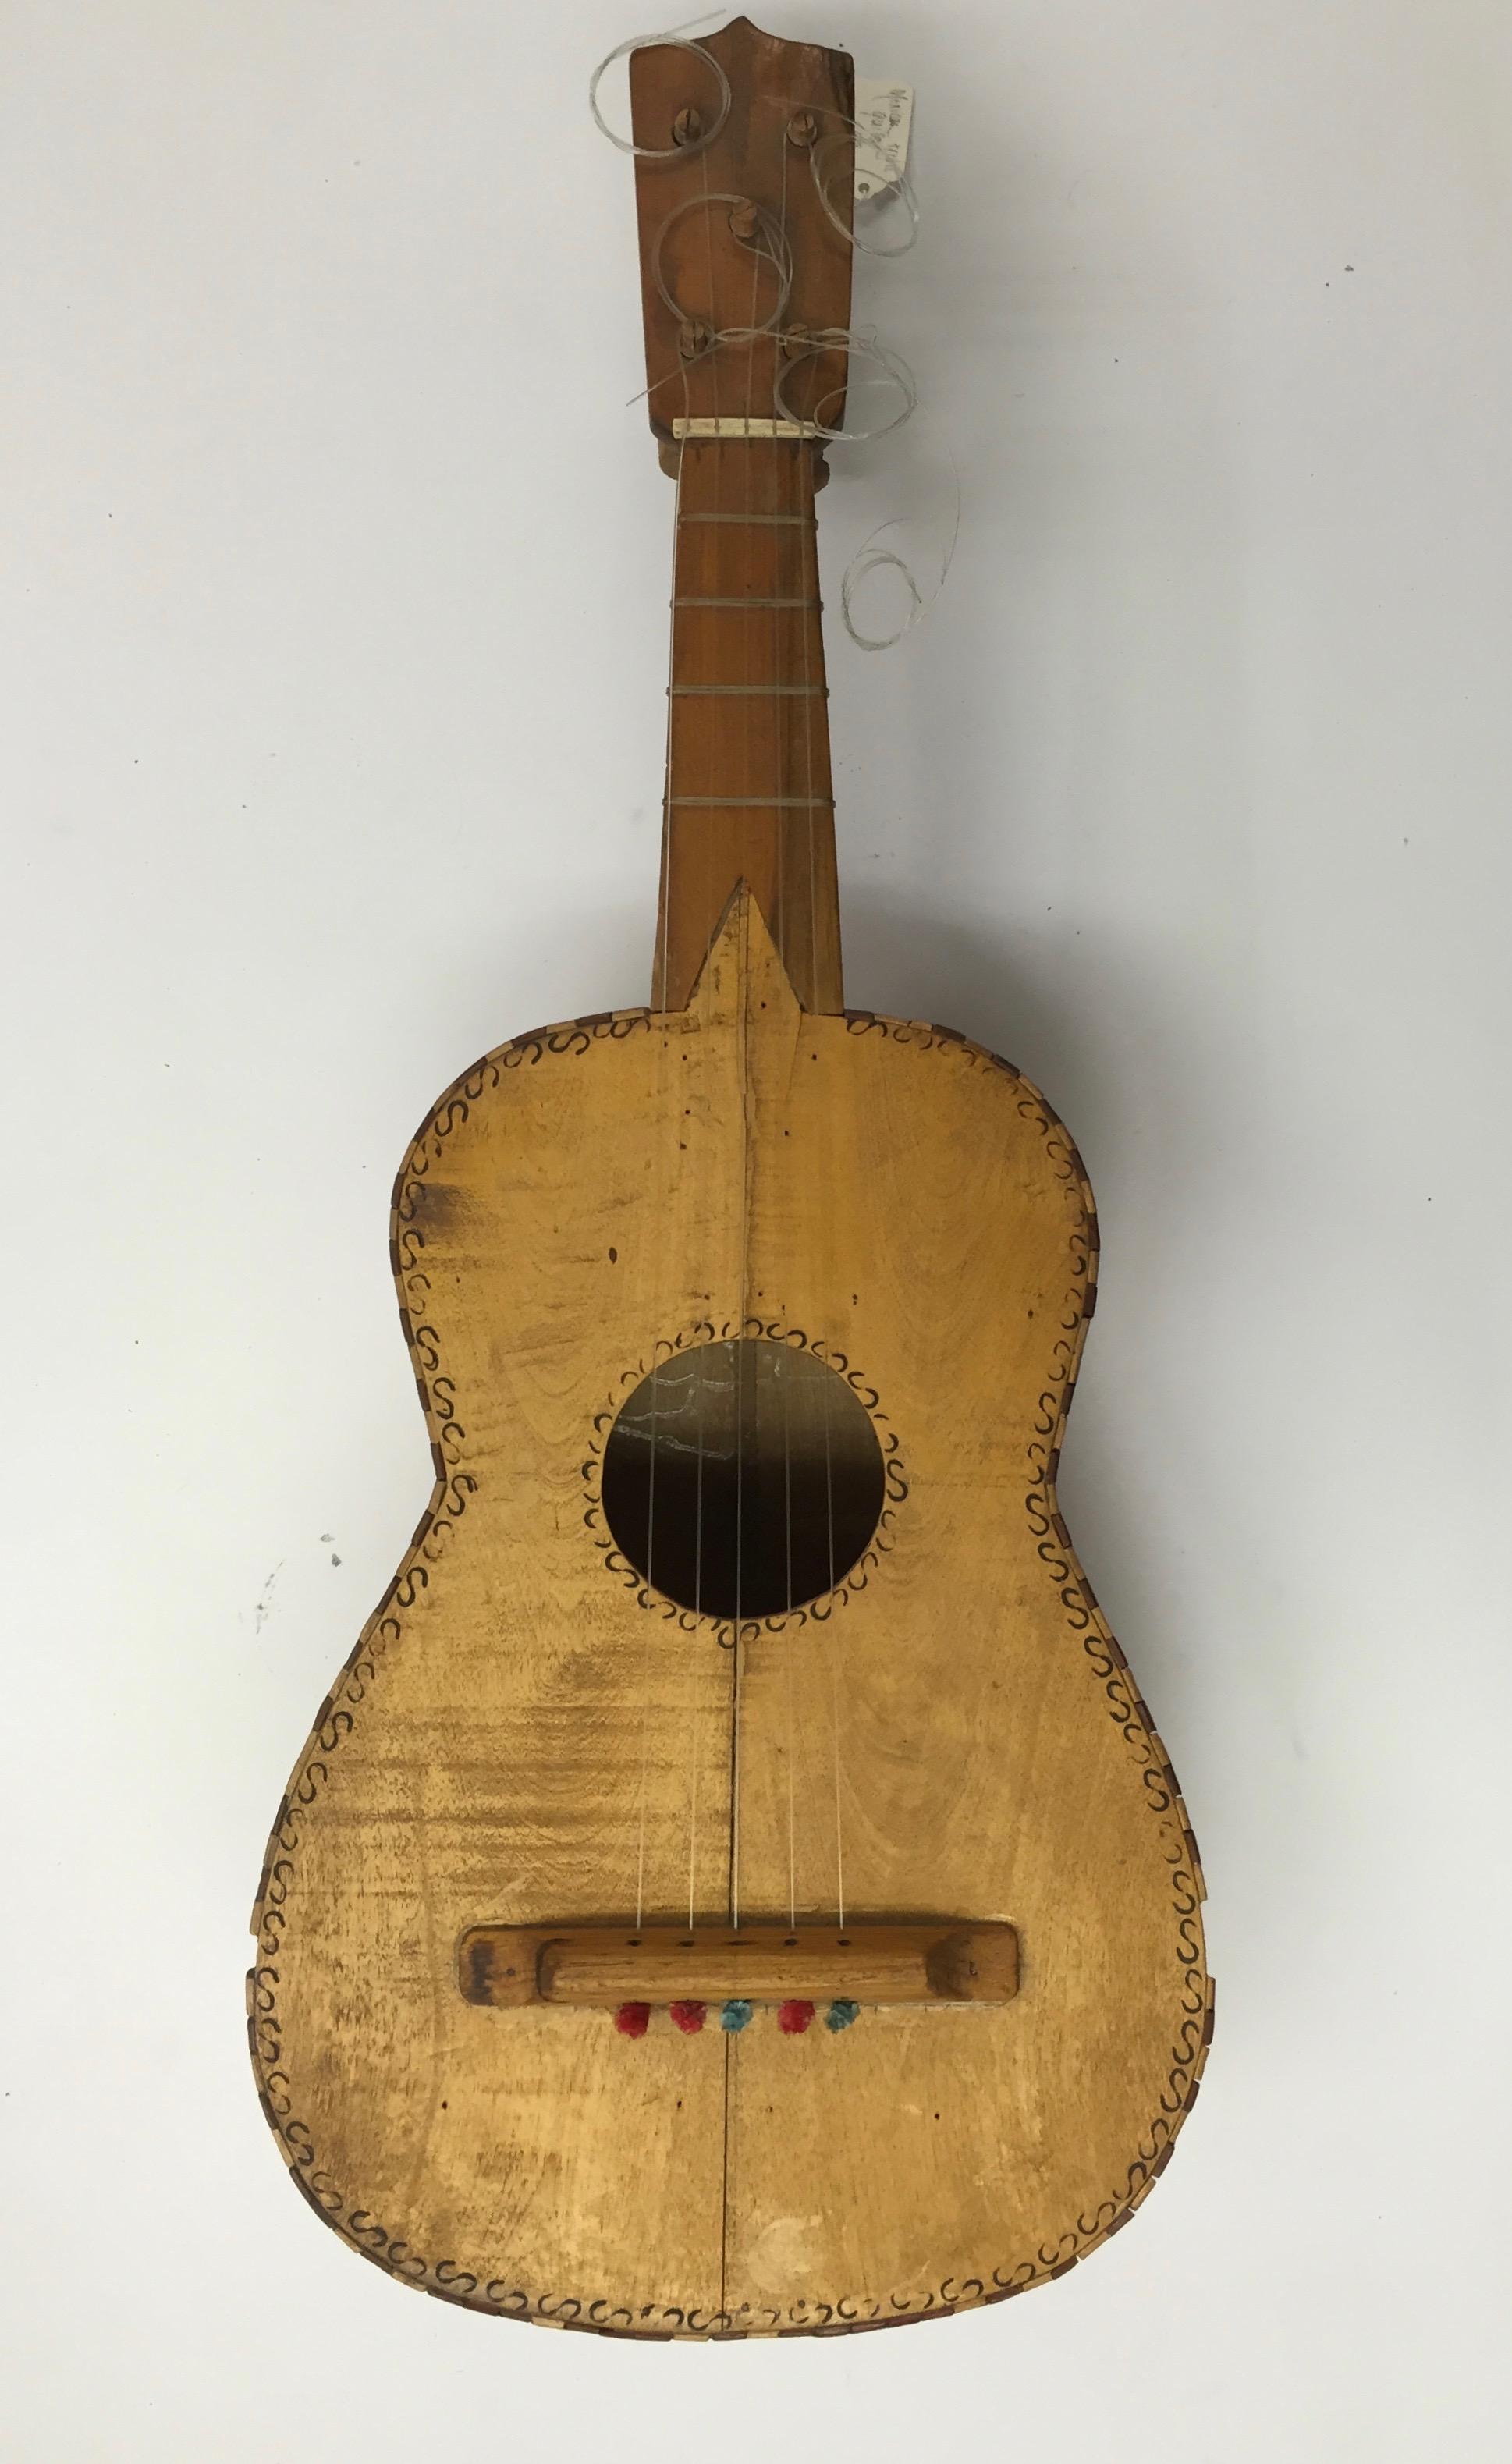 Handmade Mexican 5-string guitar